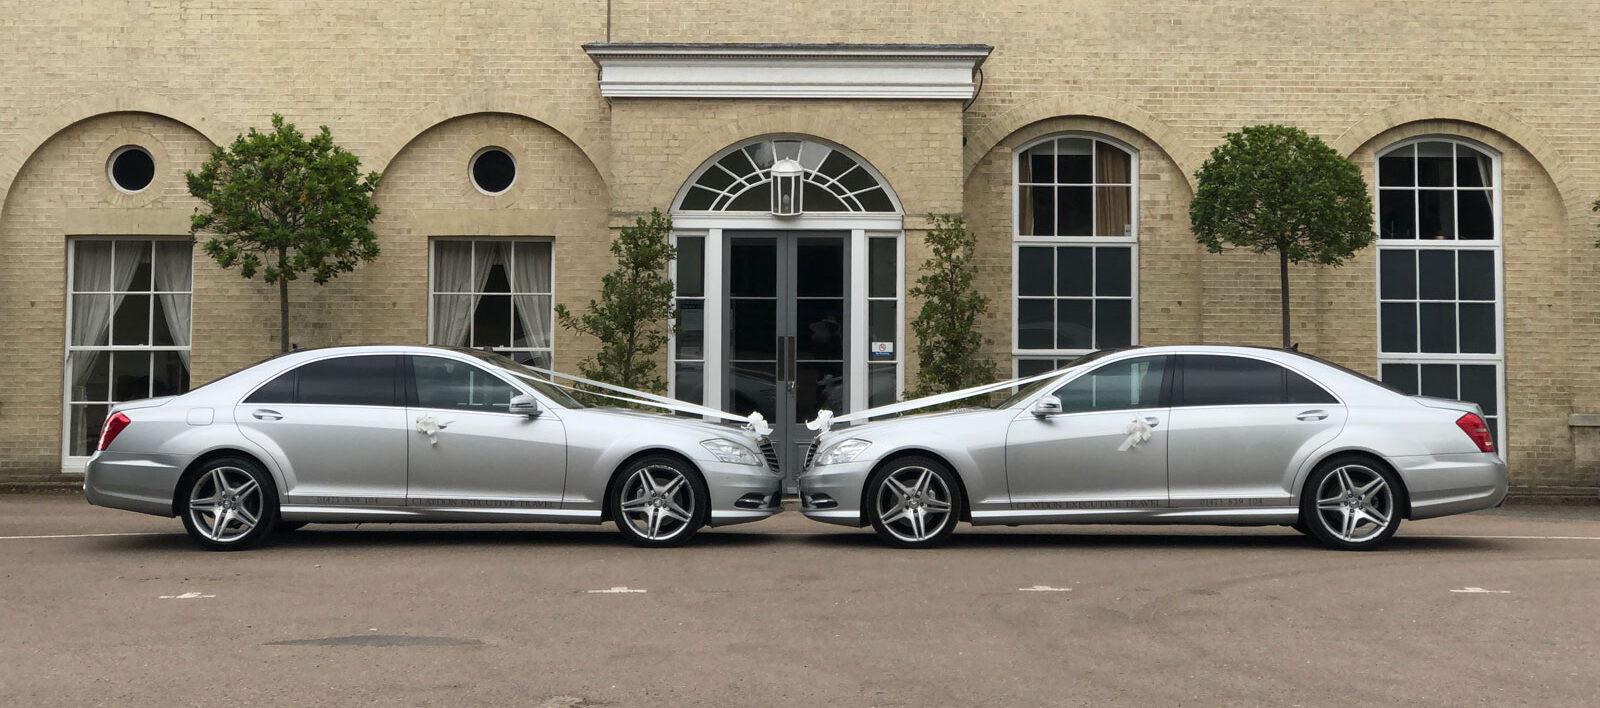 Two Claydon Executive Travel wedding cars